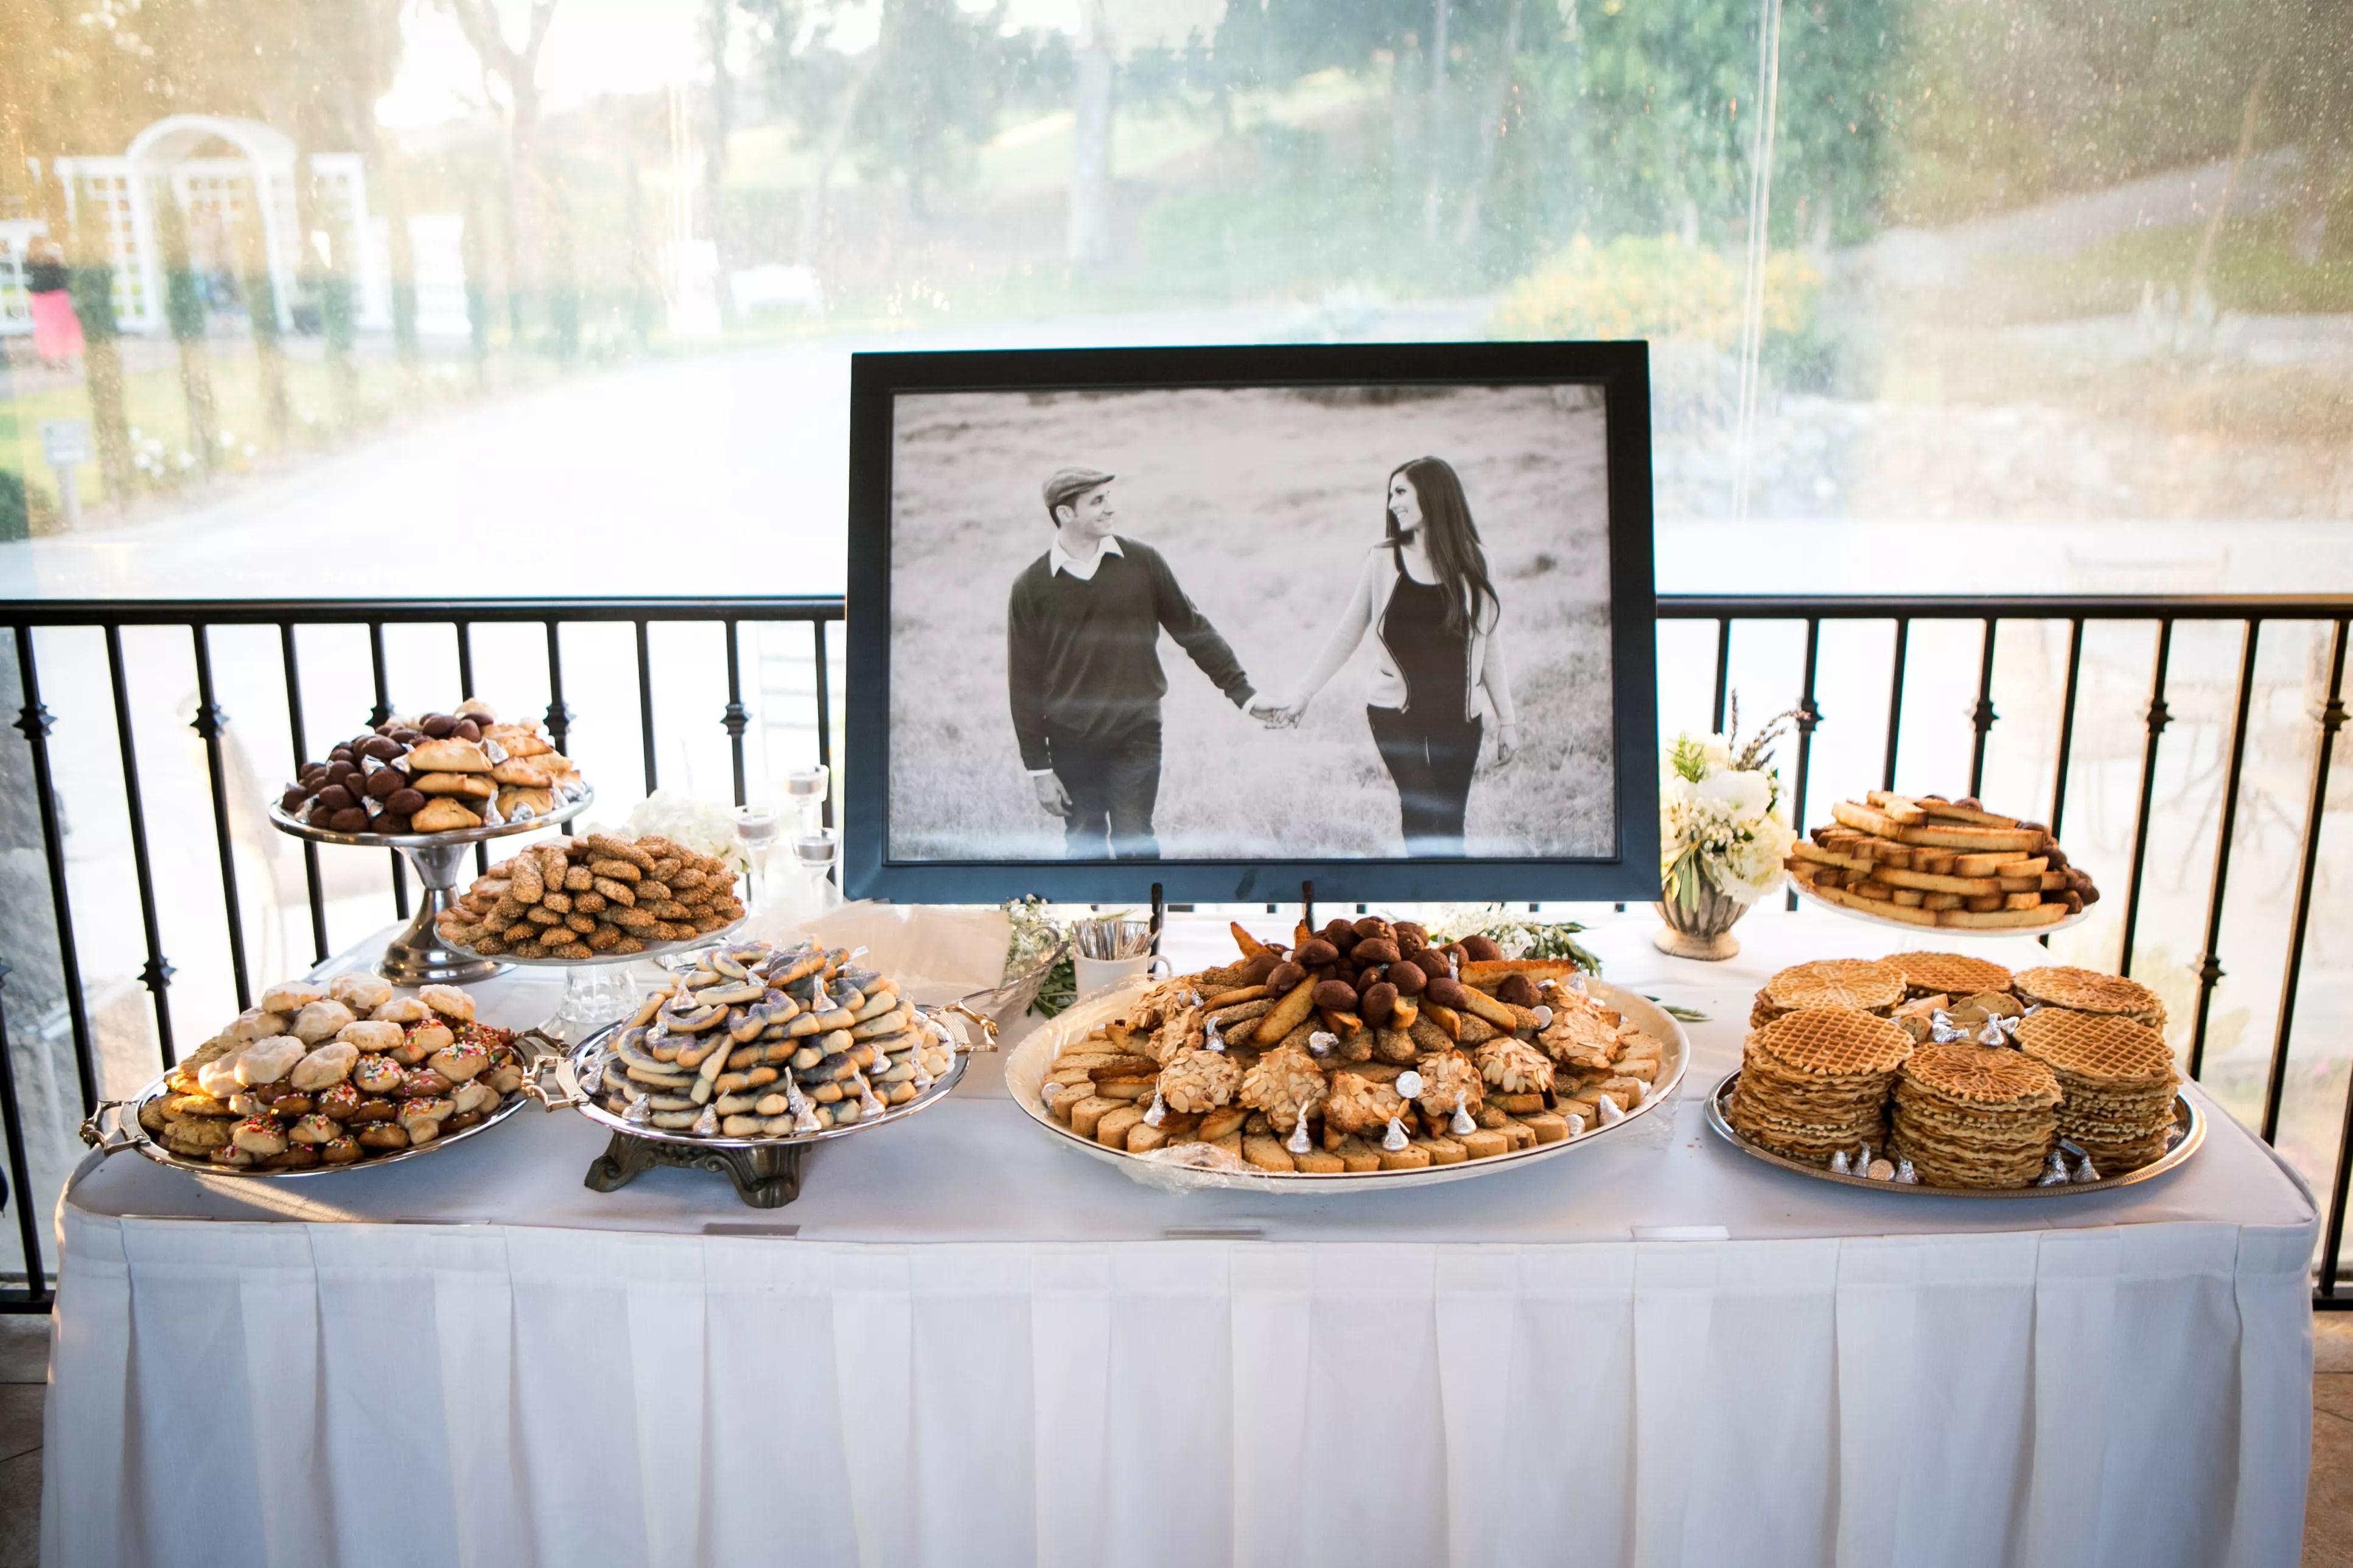 Italian Wedding Cookie Bar And Dessert Table